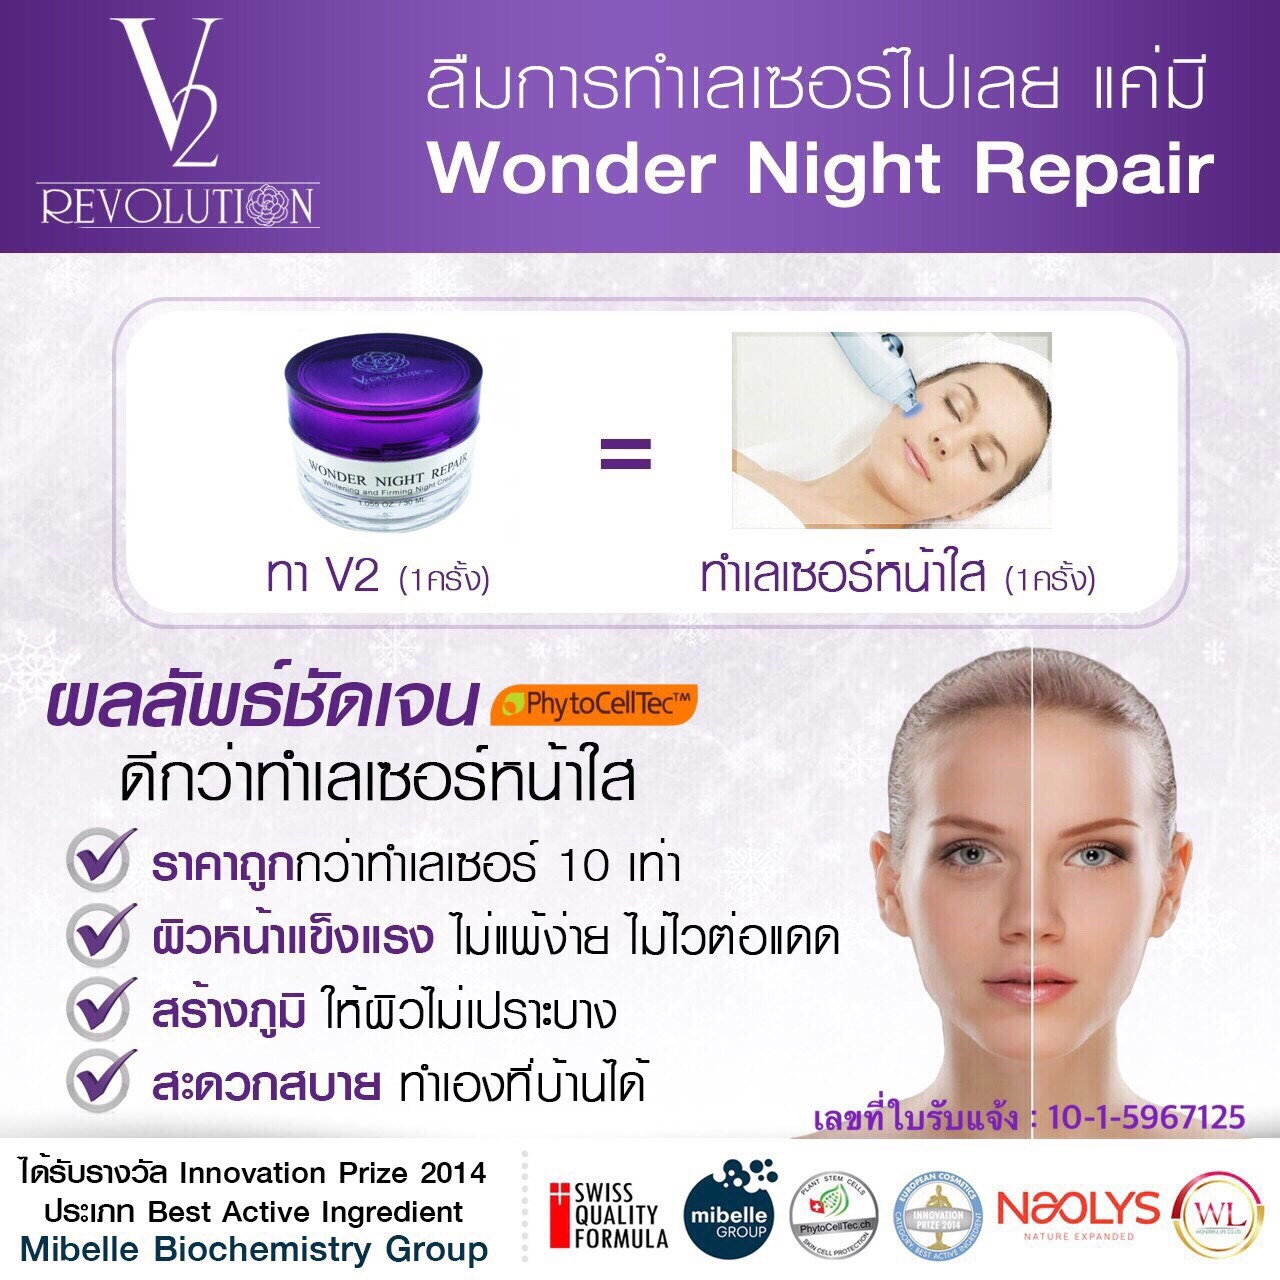 V2 Revolution Wonder Night Repair วีทู เรฟโวลูชั่น วันเดอร์ ไนท์ รีแพร์